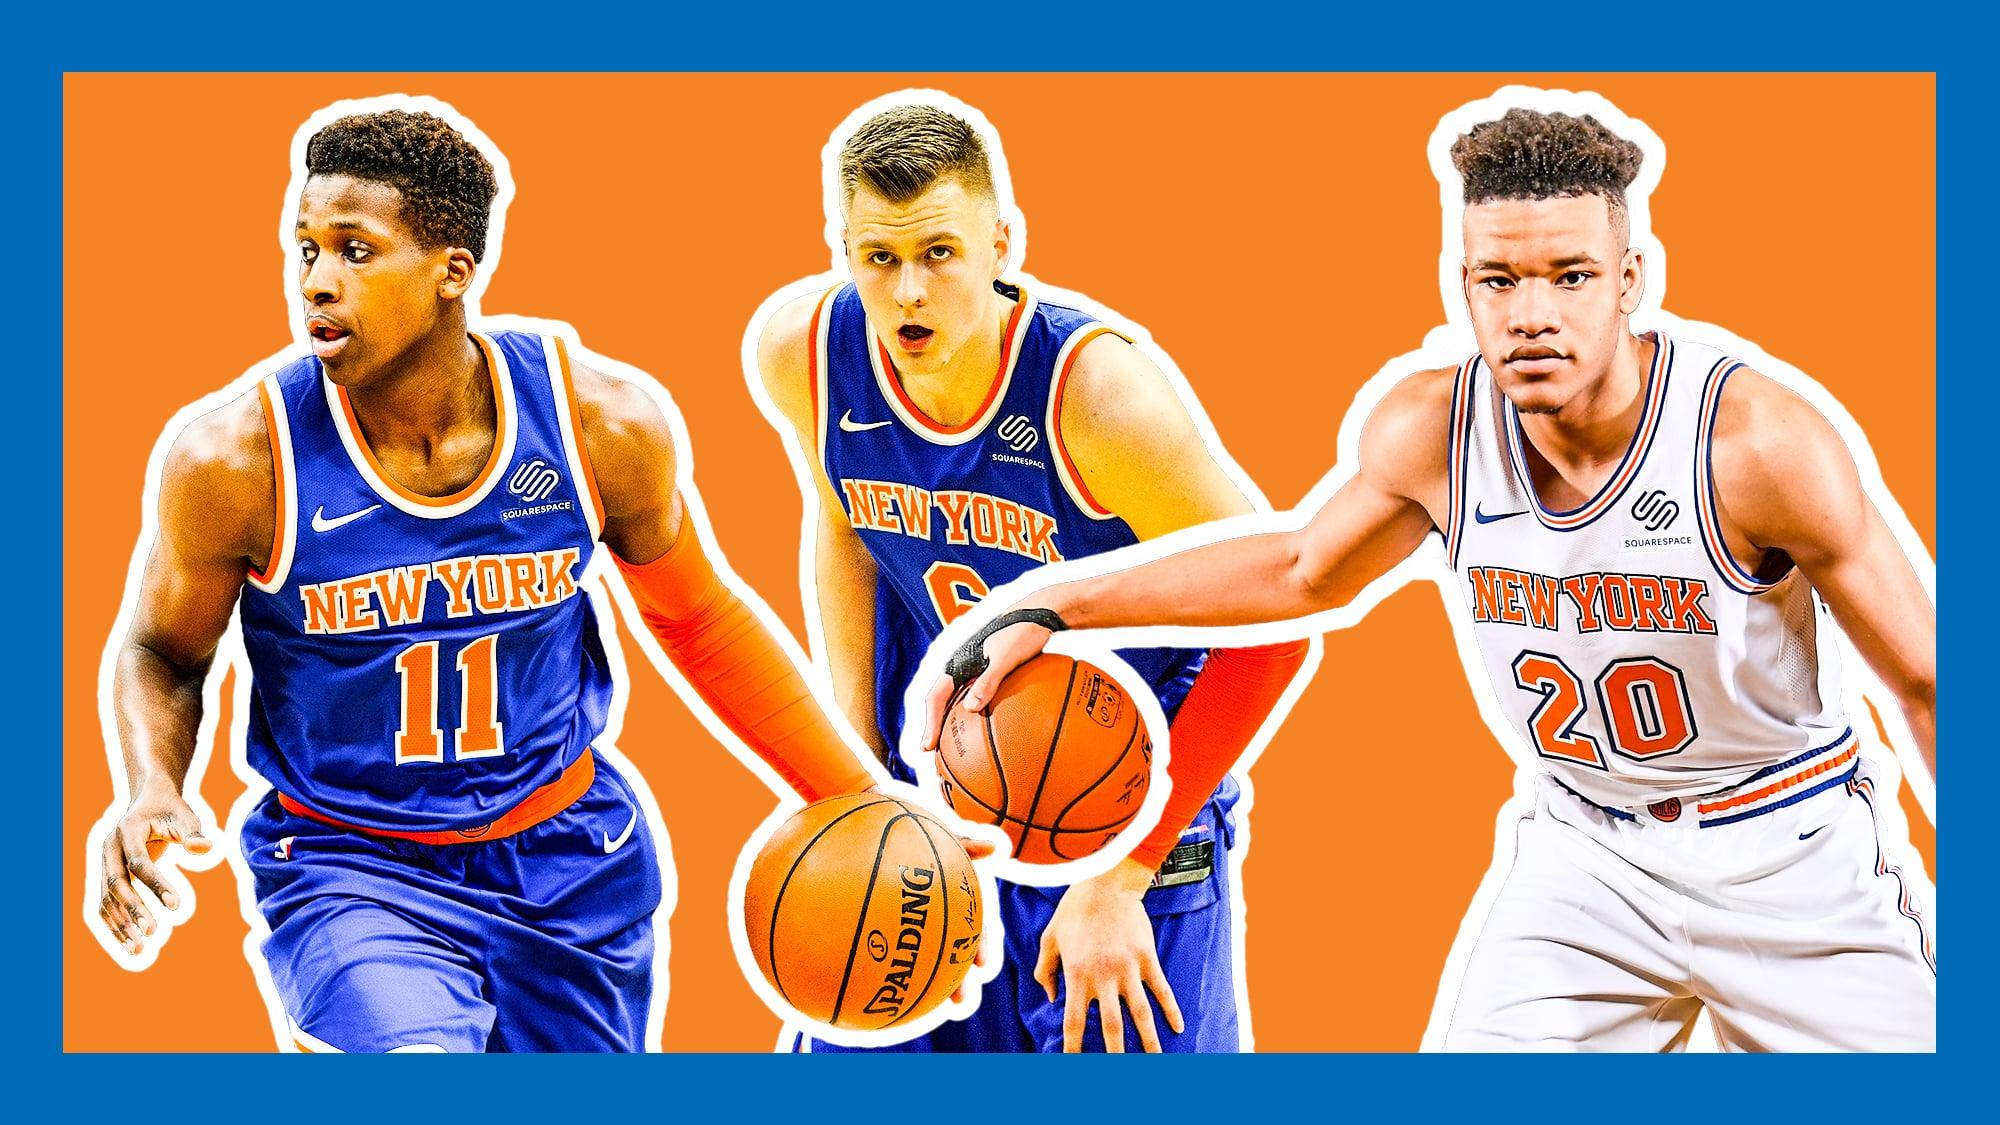 New York Knicks Finding a balance with Kristaps Porzingis return 2000x1125